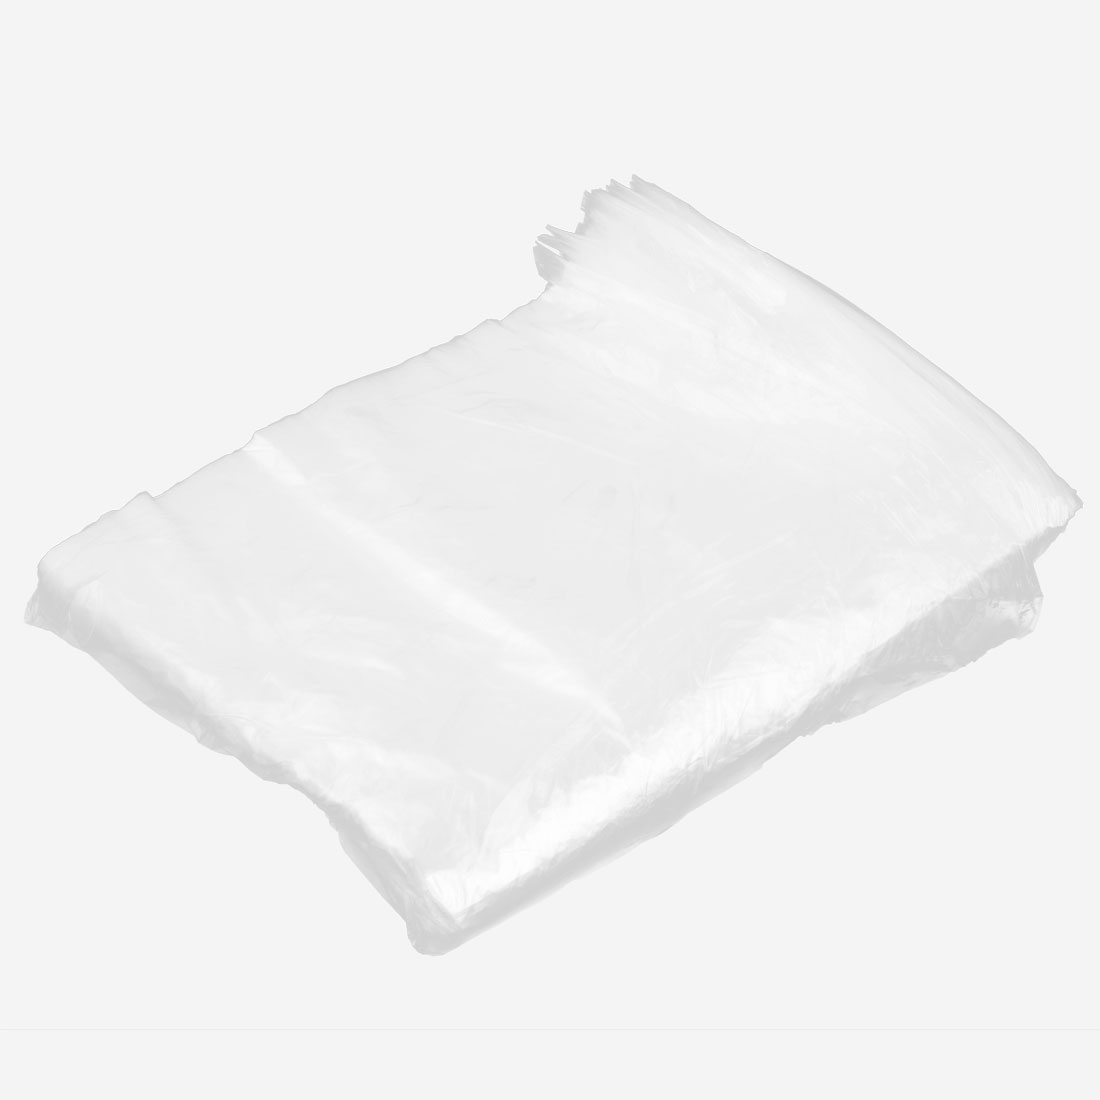 Spa Pedicure Disposable Liner Footsie Bath Foot Tub Bag 65 x 54cm 90pcs